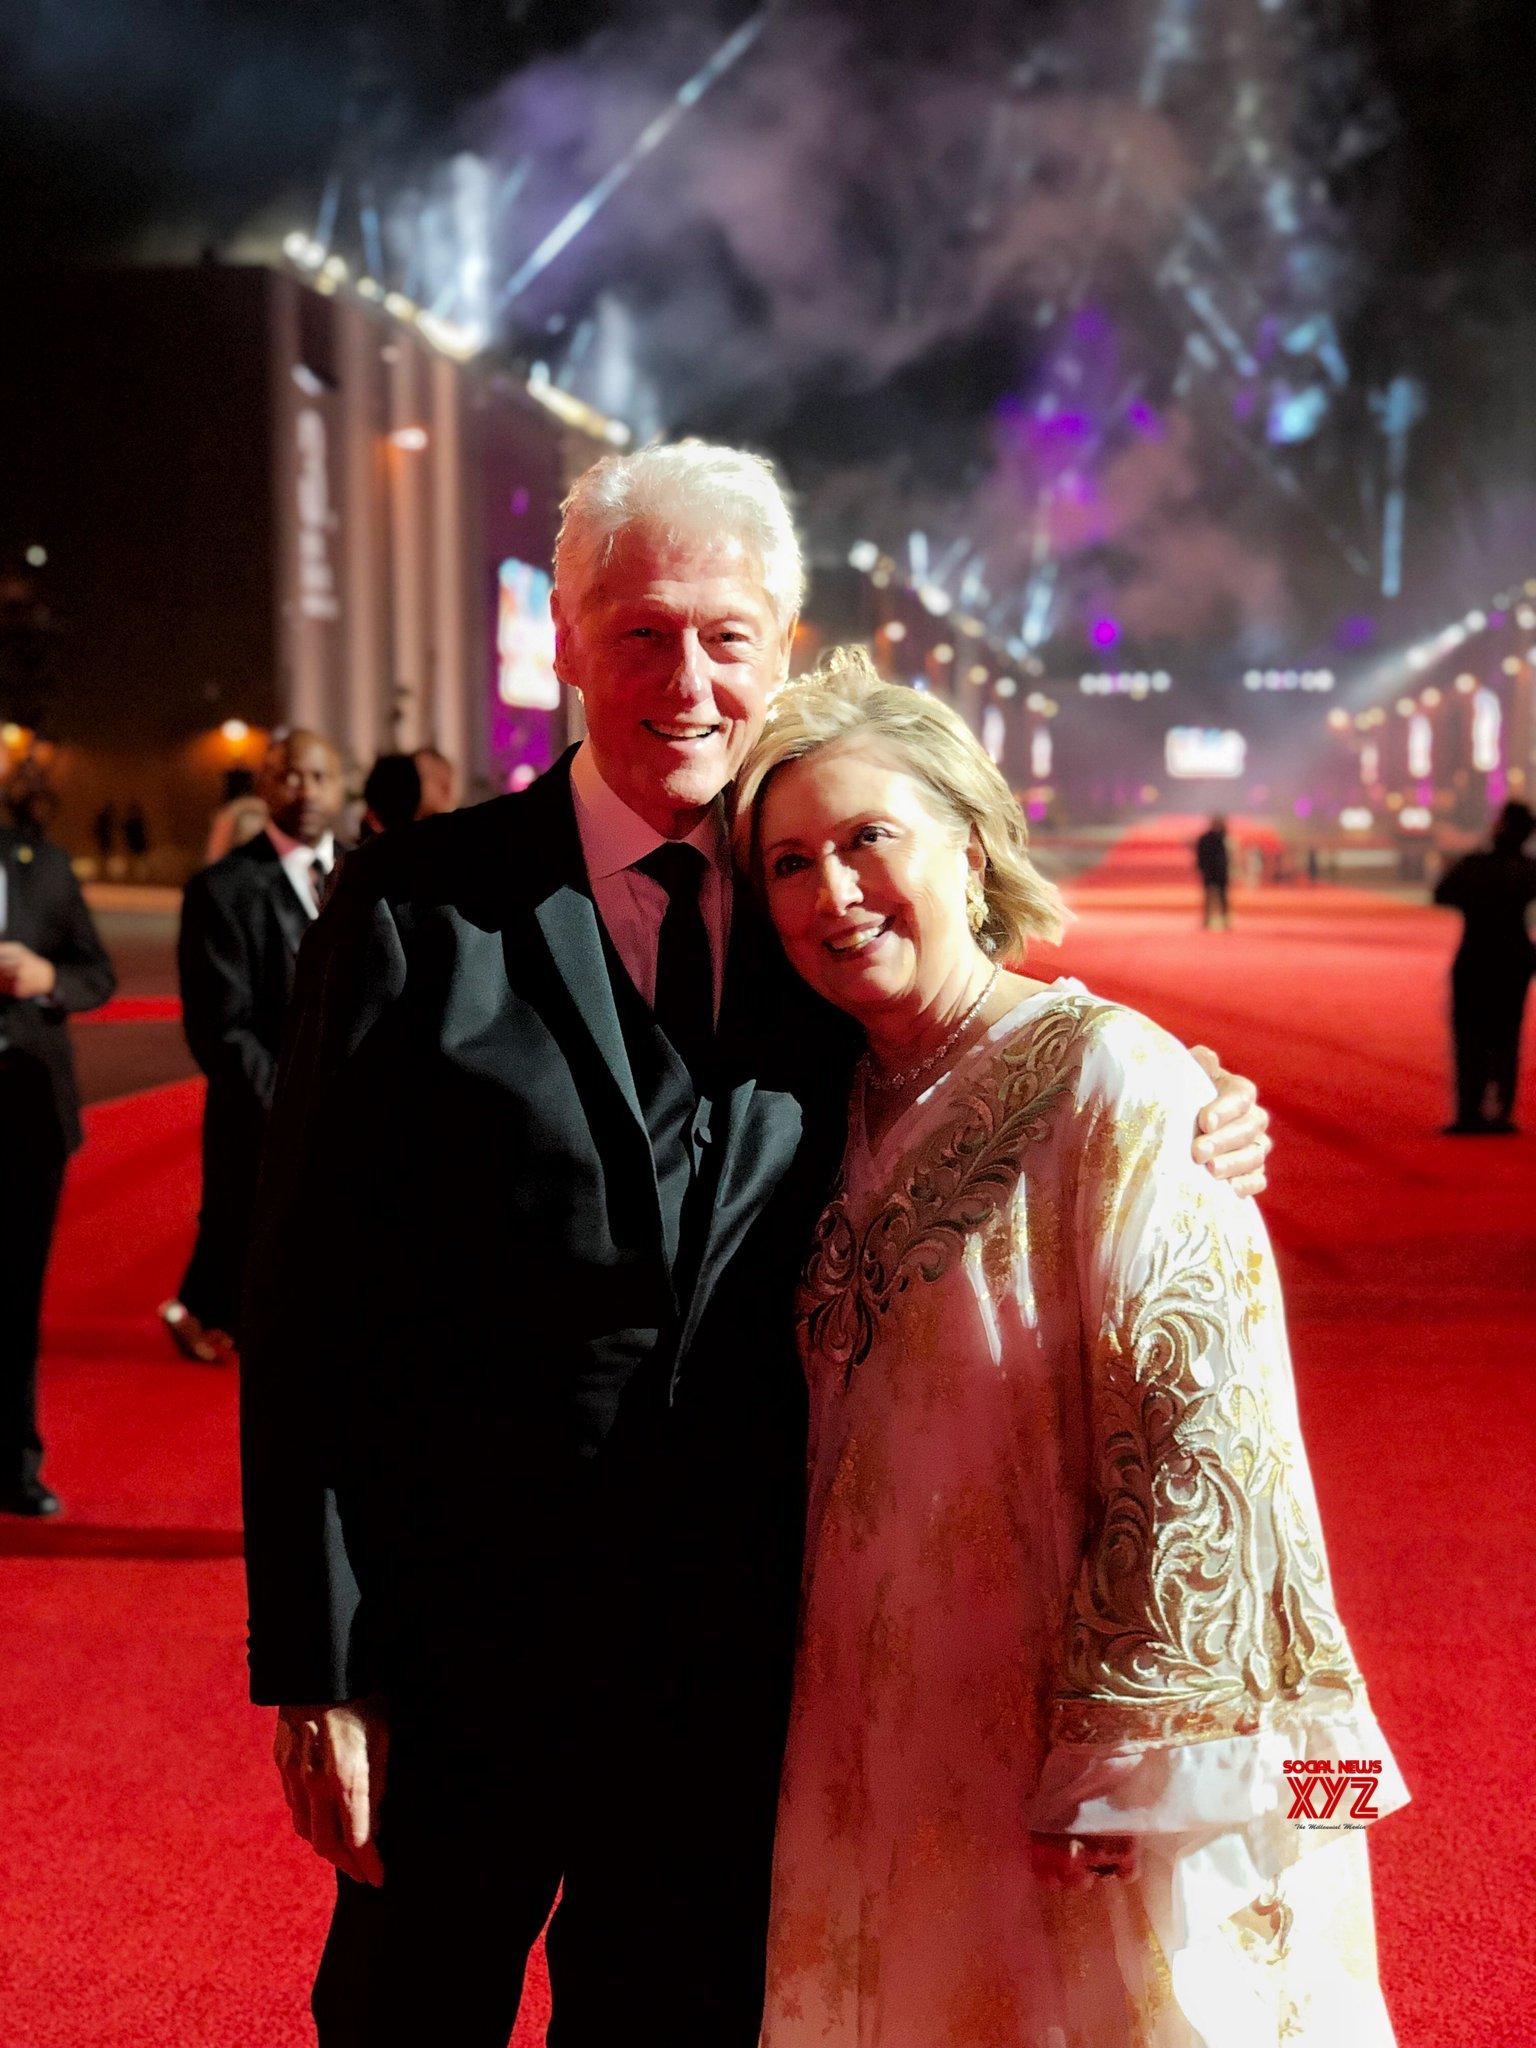 Bill Clinton And Hillary Clinton's 44th Anniversary Special Still